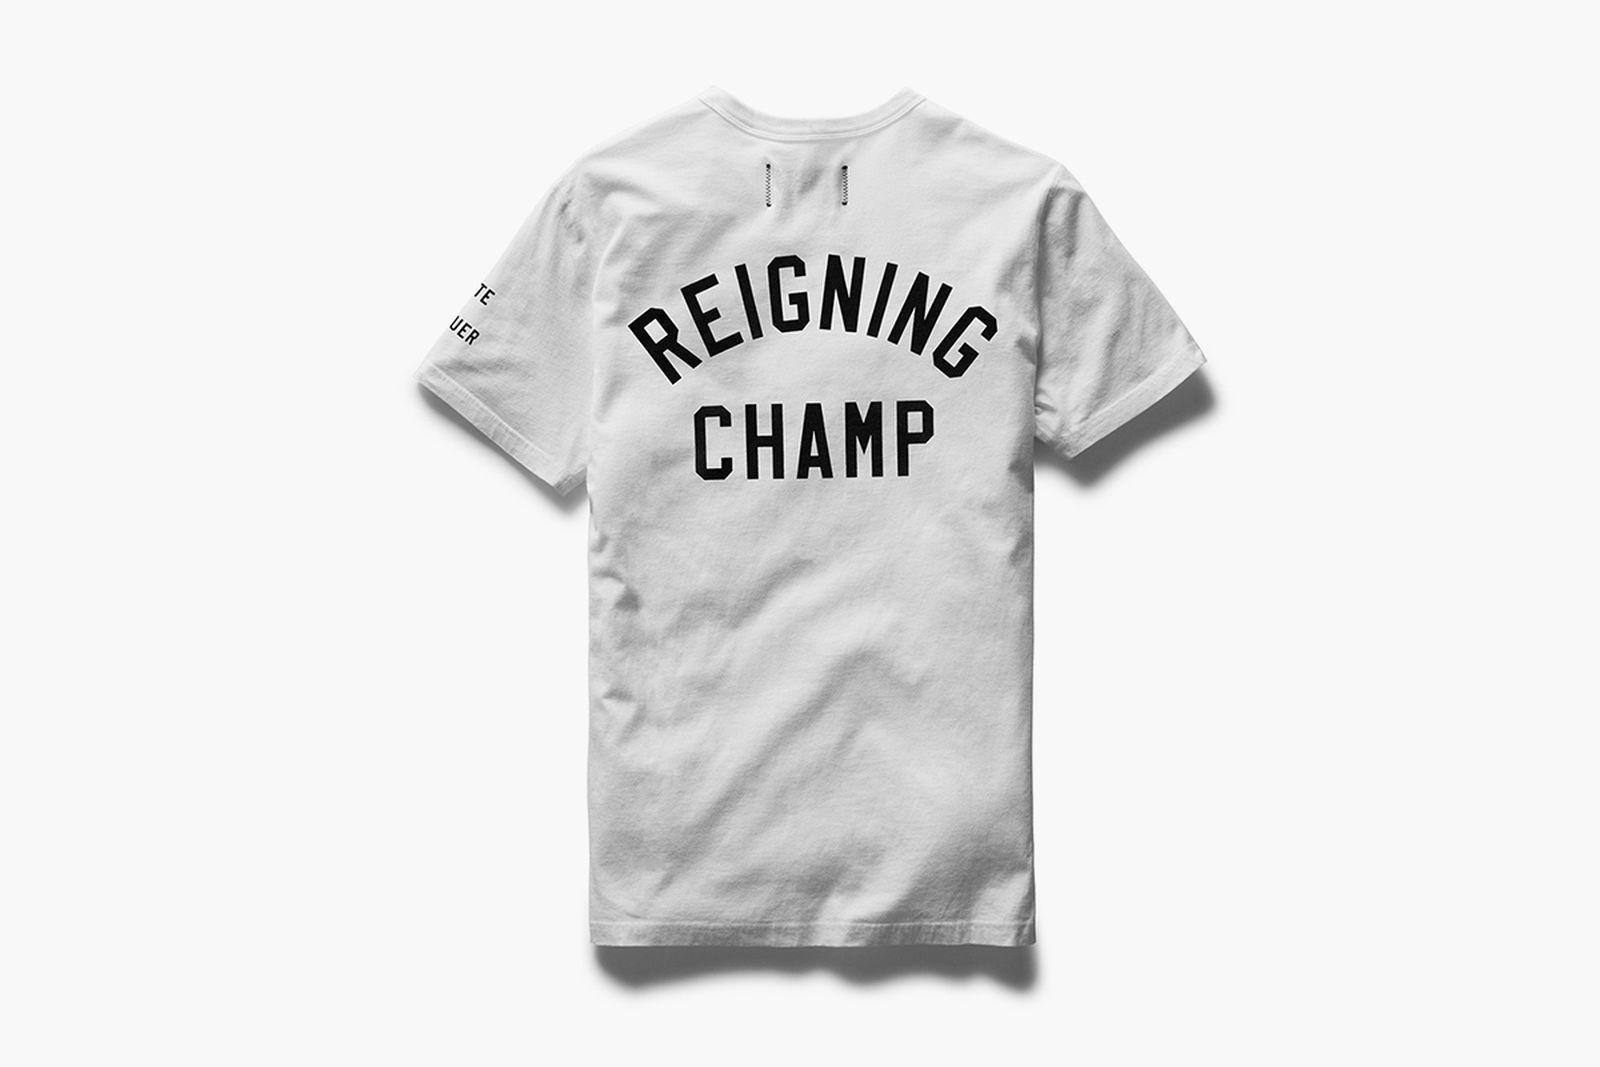 reigning champ atlanta united mls champions pack